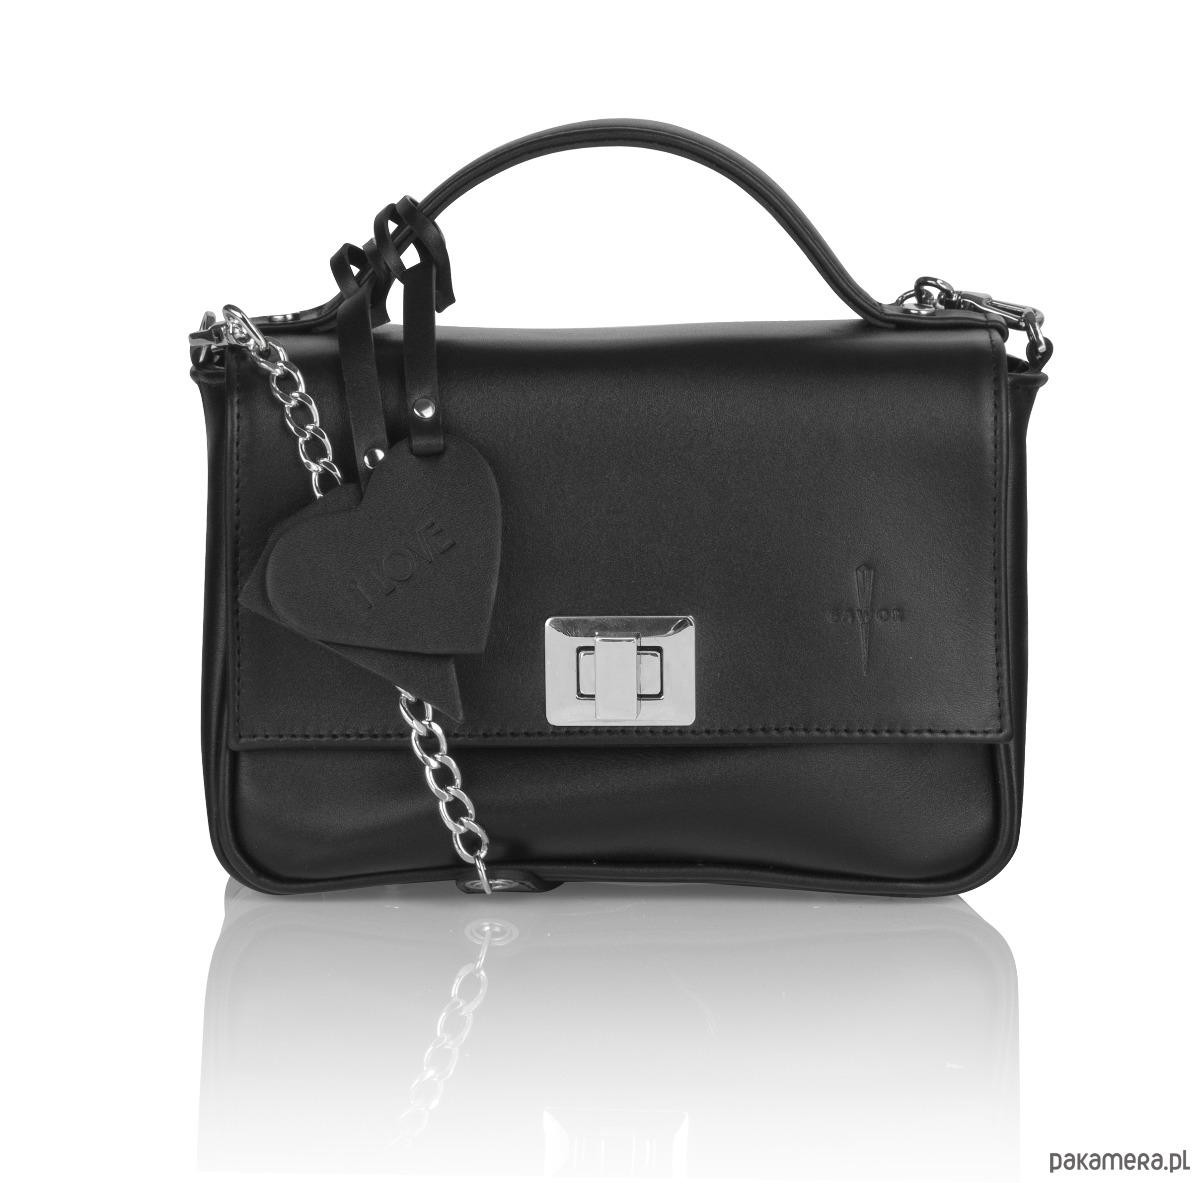 8331f10ff3e52 Skórzana torebka kuferek czarny Piccolina G-98 - torebki mini ...